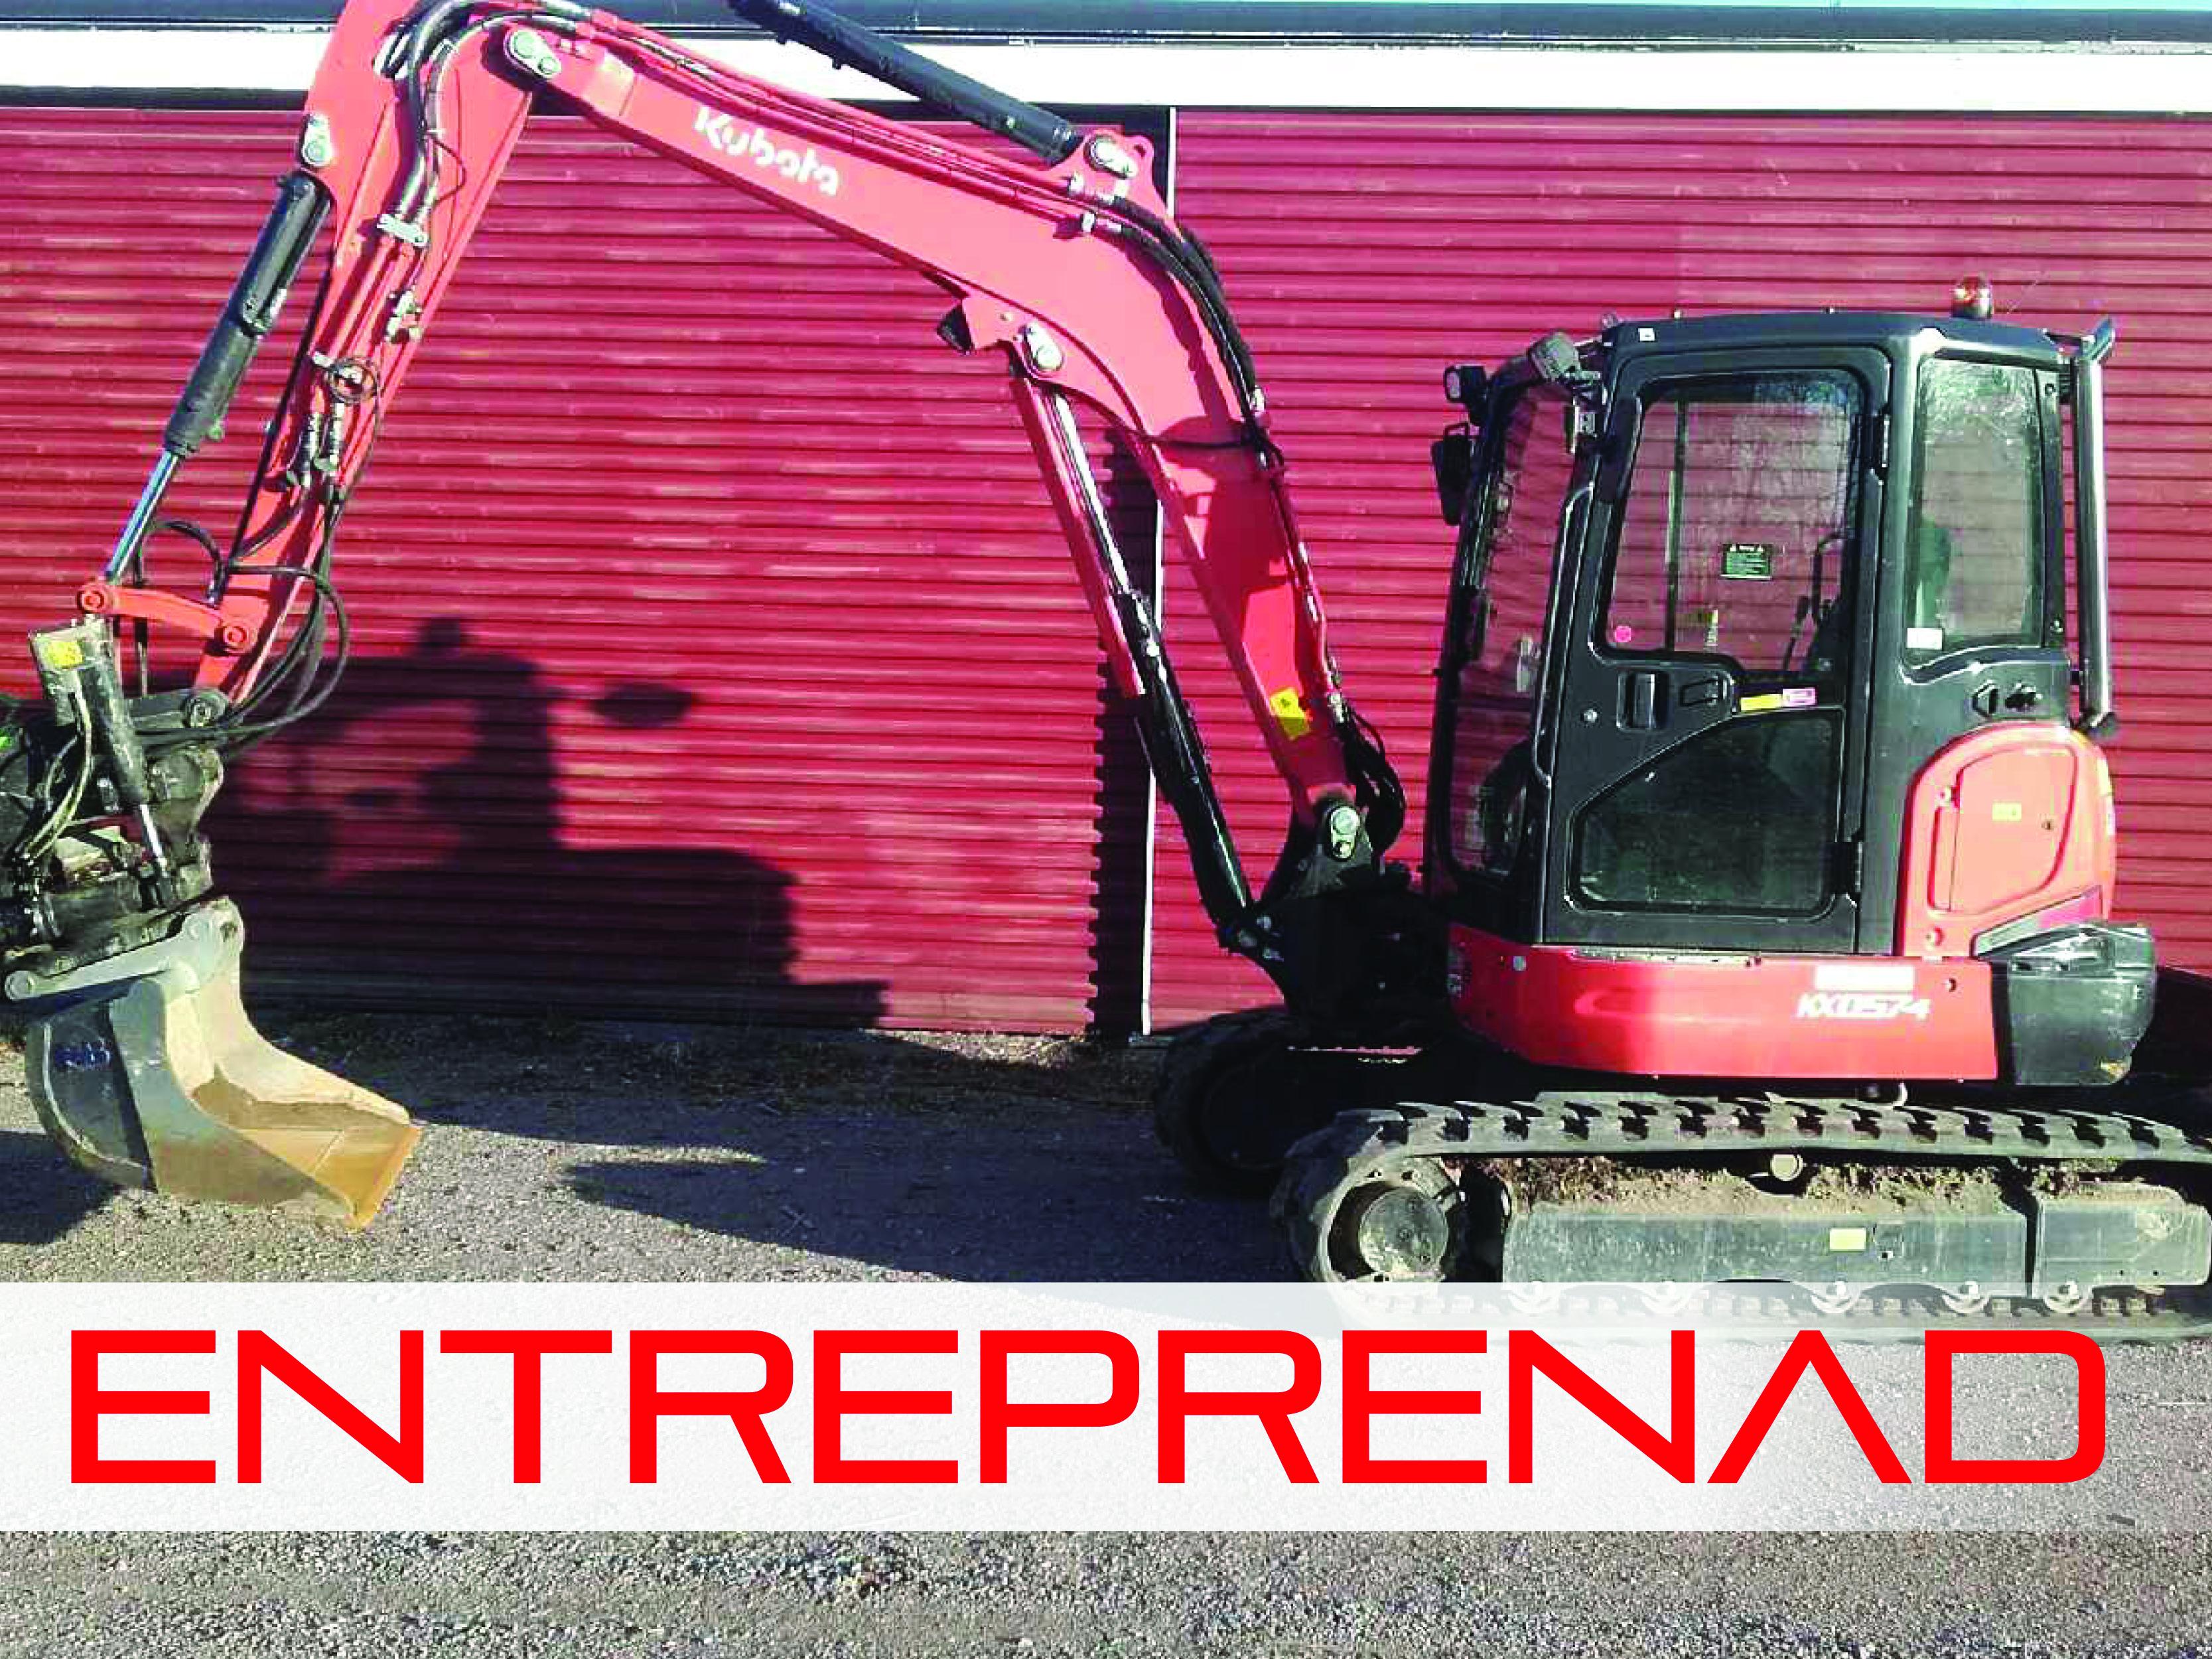 Entreprenad